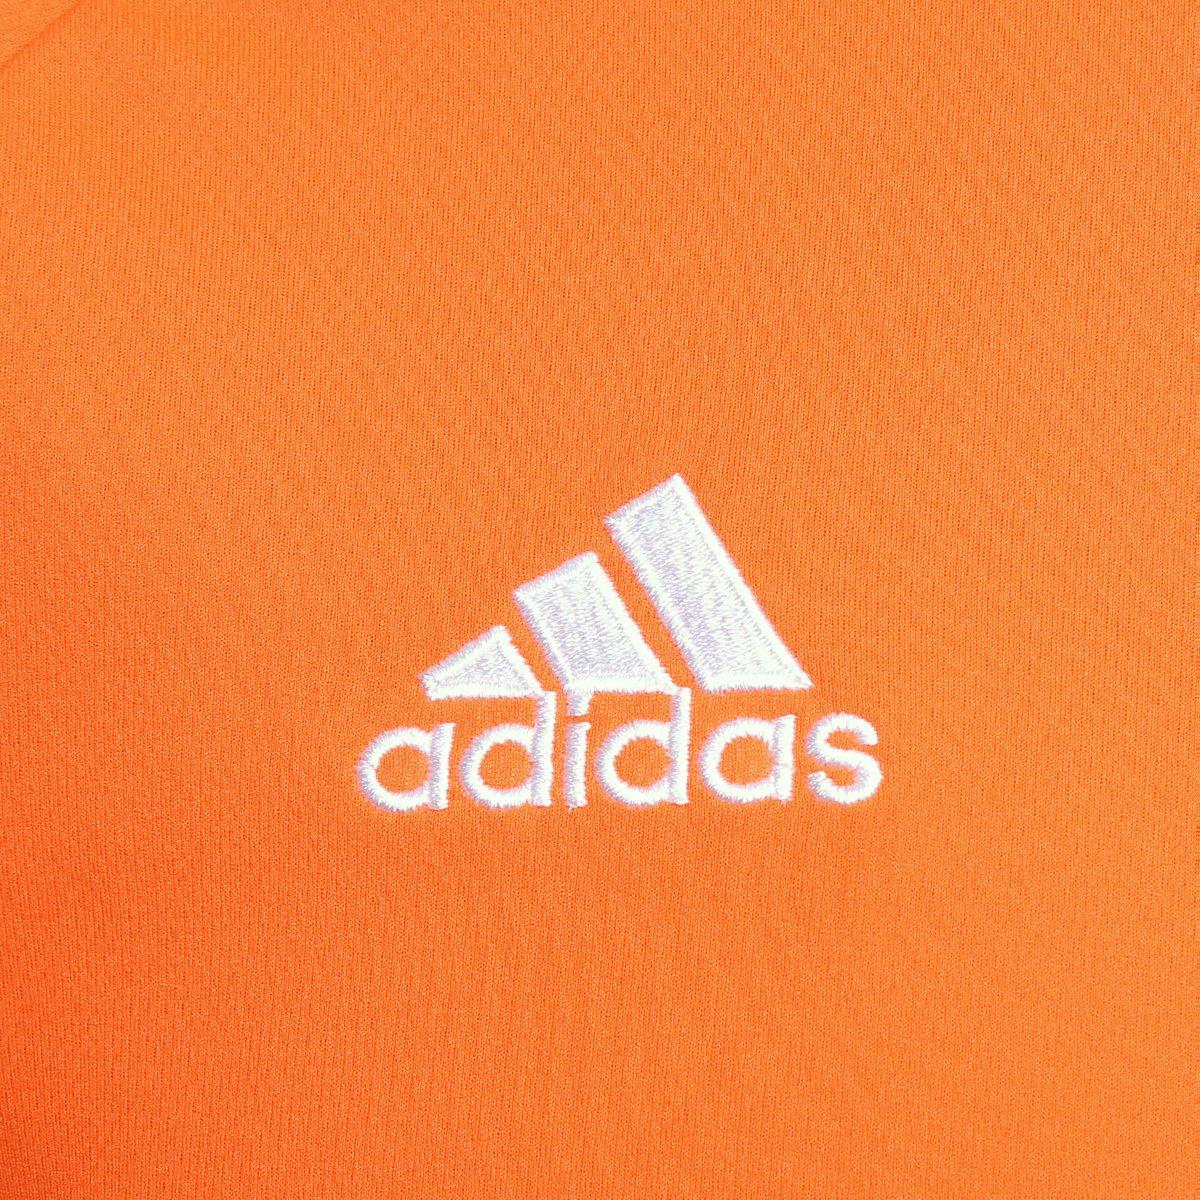 9db3c2e95f Camisa Adidas Estro 15 Masculina - Laranja e Branco - Compre Agora ...